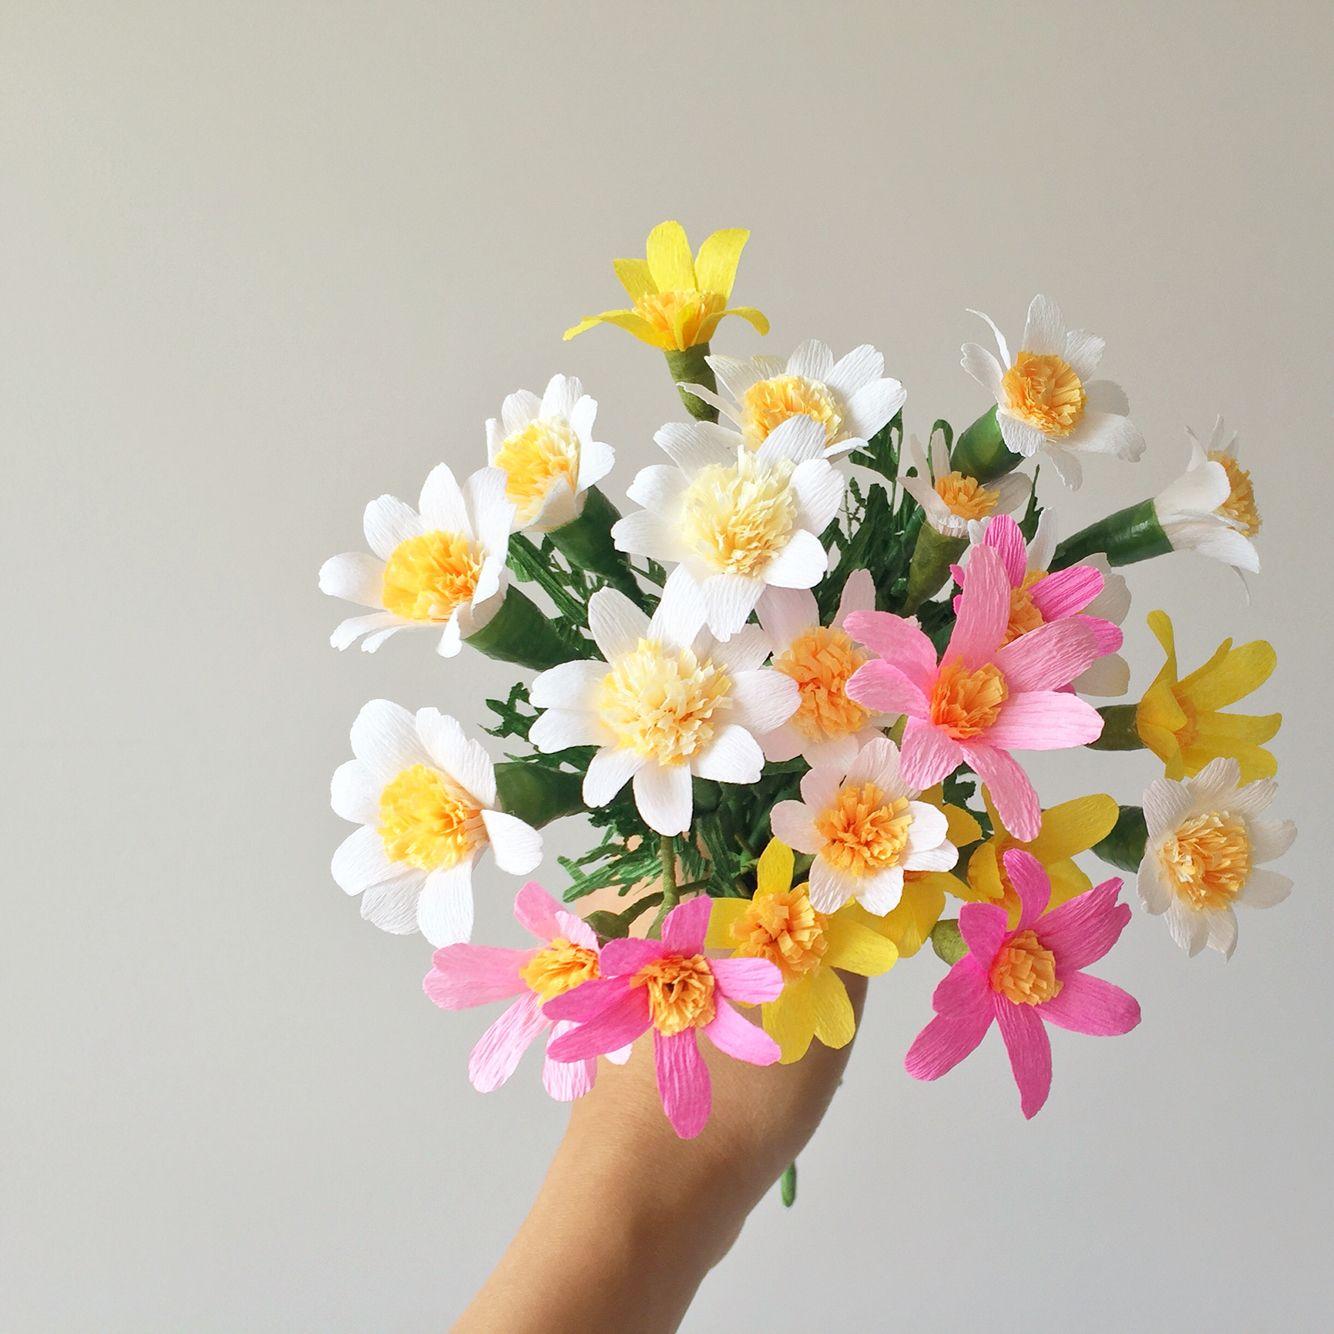 Crepe Paper Daisies By Flowerfilledlife Crepe Paper Pinterest